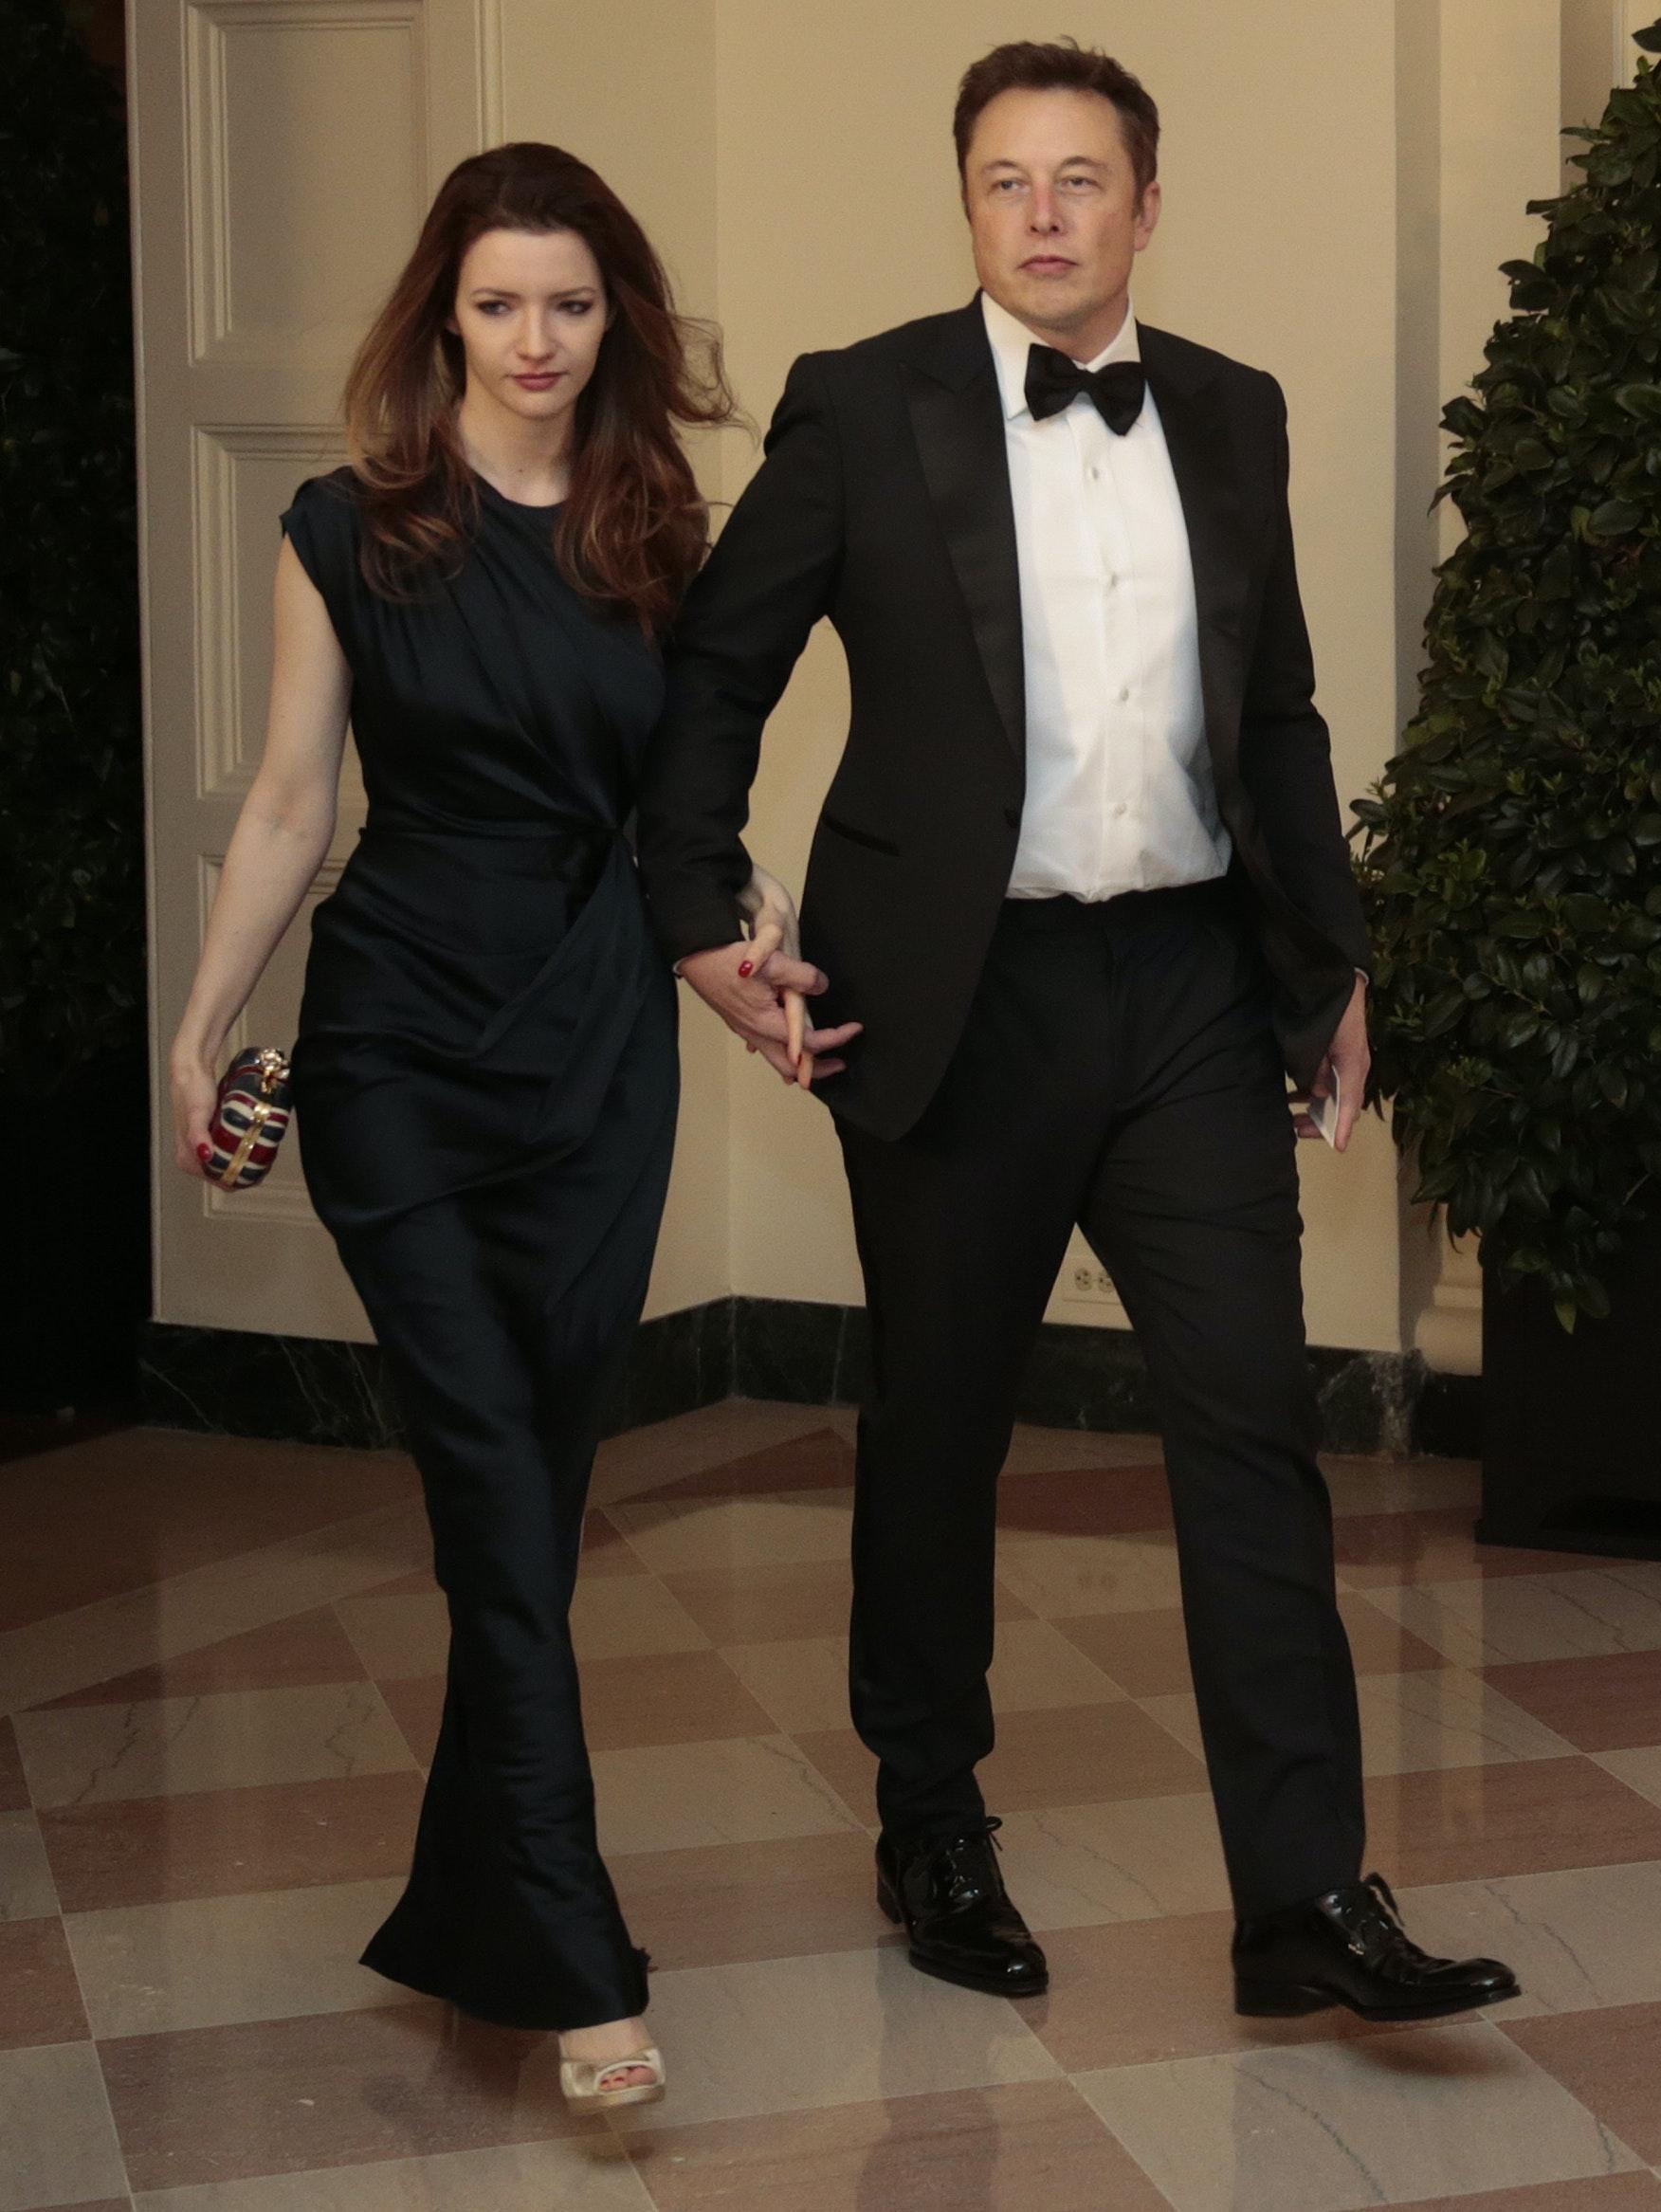 Elon Musk and Talulah Musk